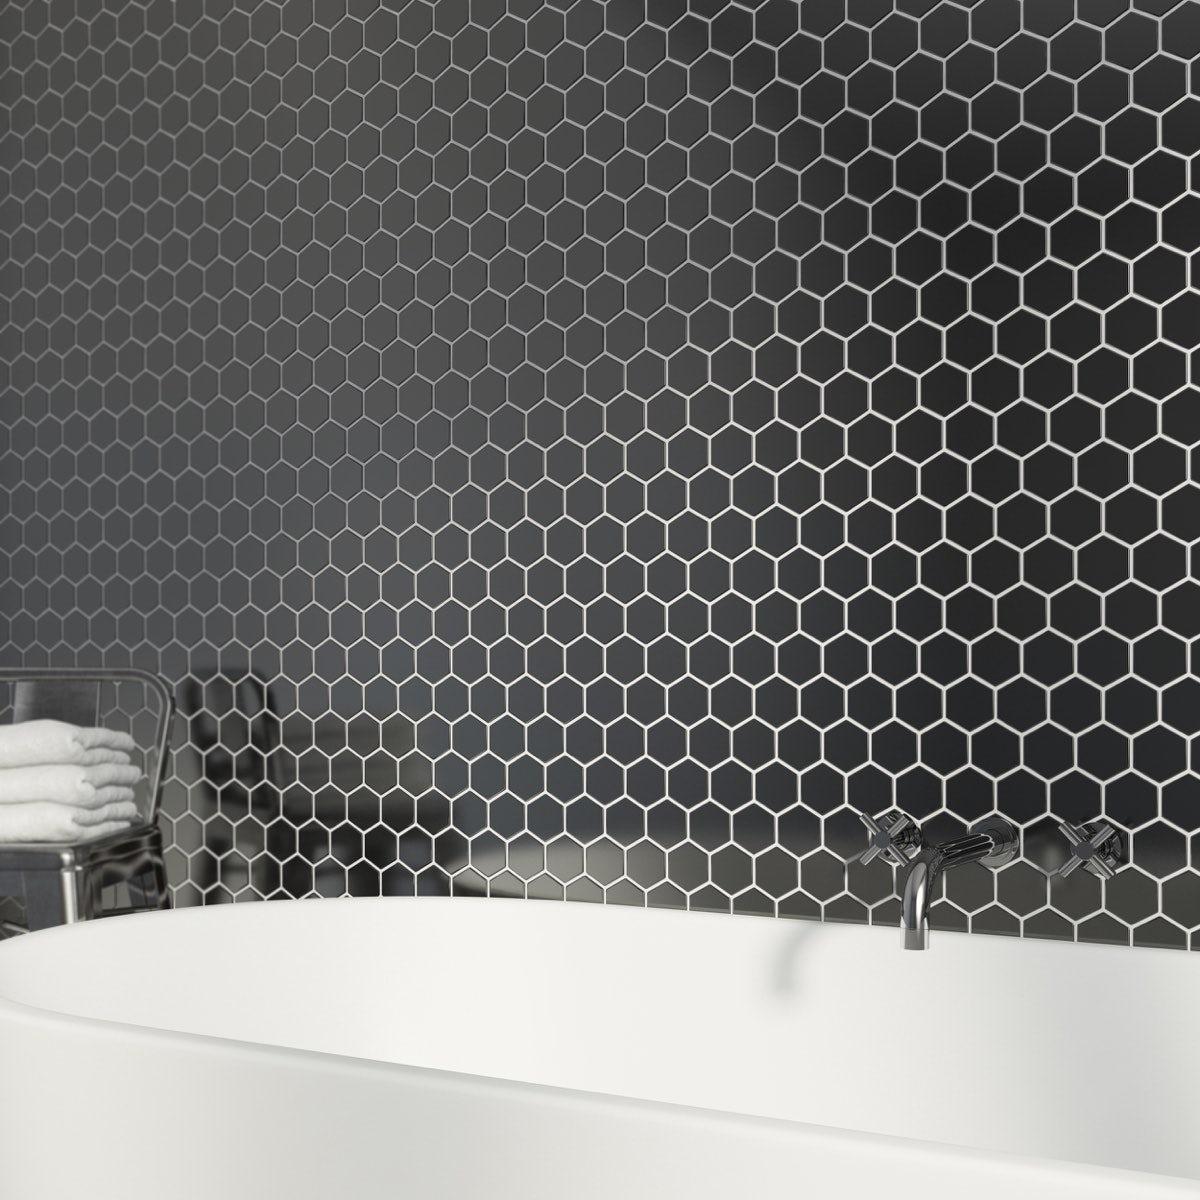 British Ceramic Tile Mosaic Hex Black Gloss Tile 300mm X 300mm   1 Sheet Part 61